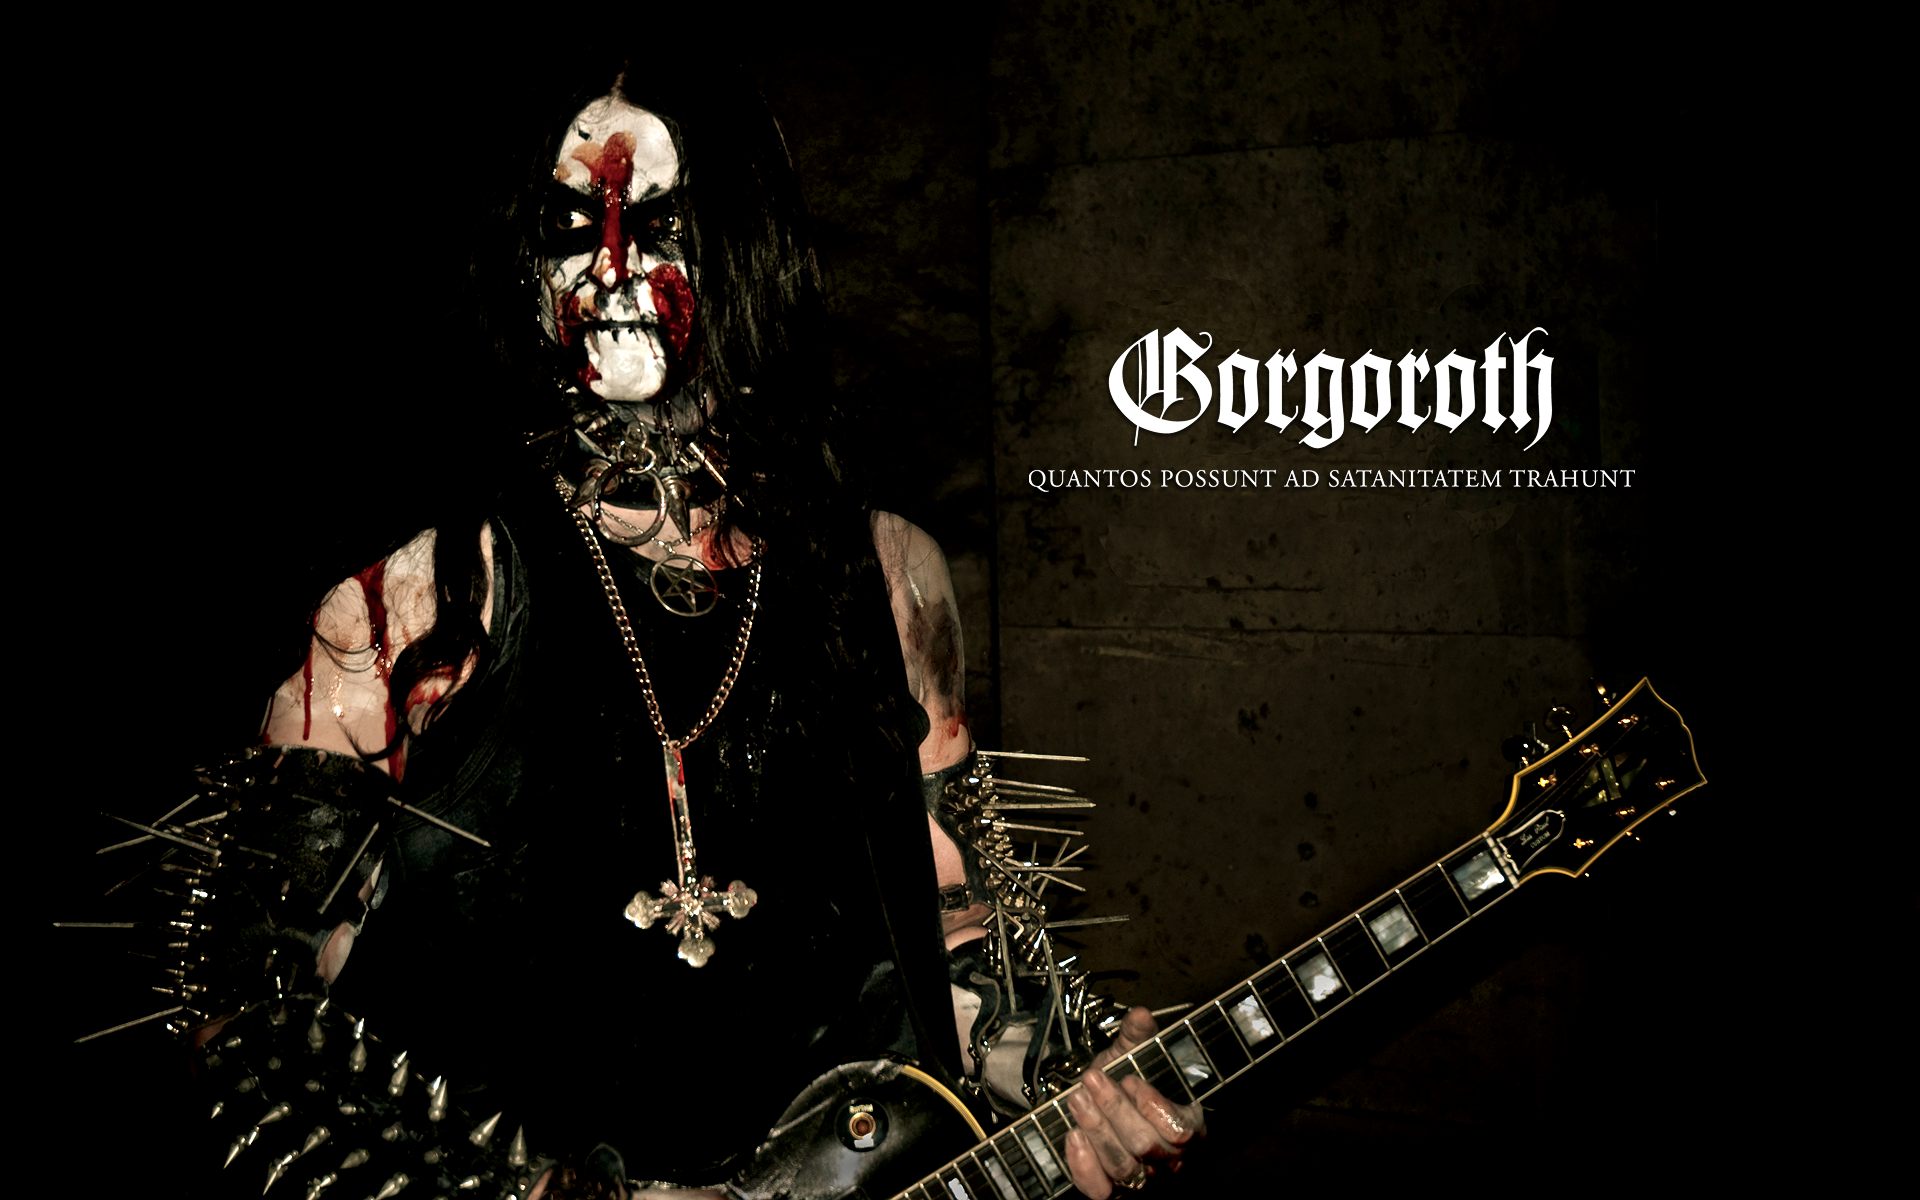 Gorgoroth - 1920x1200